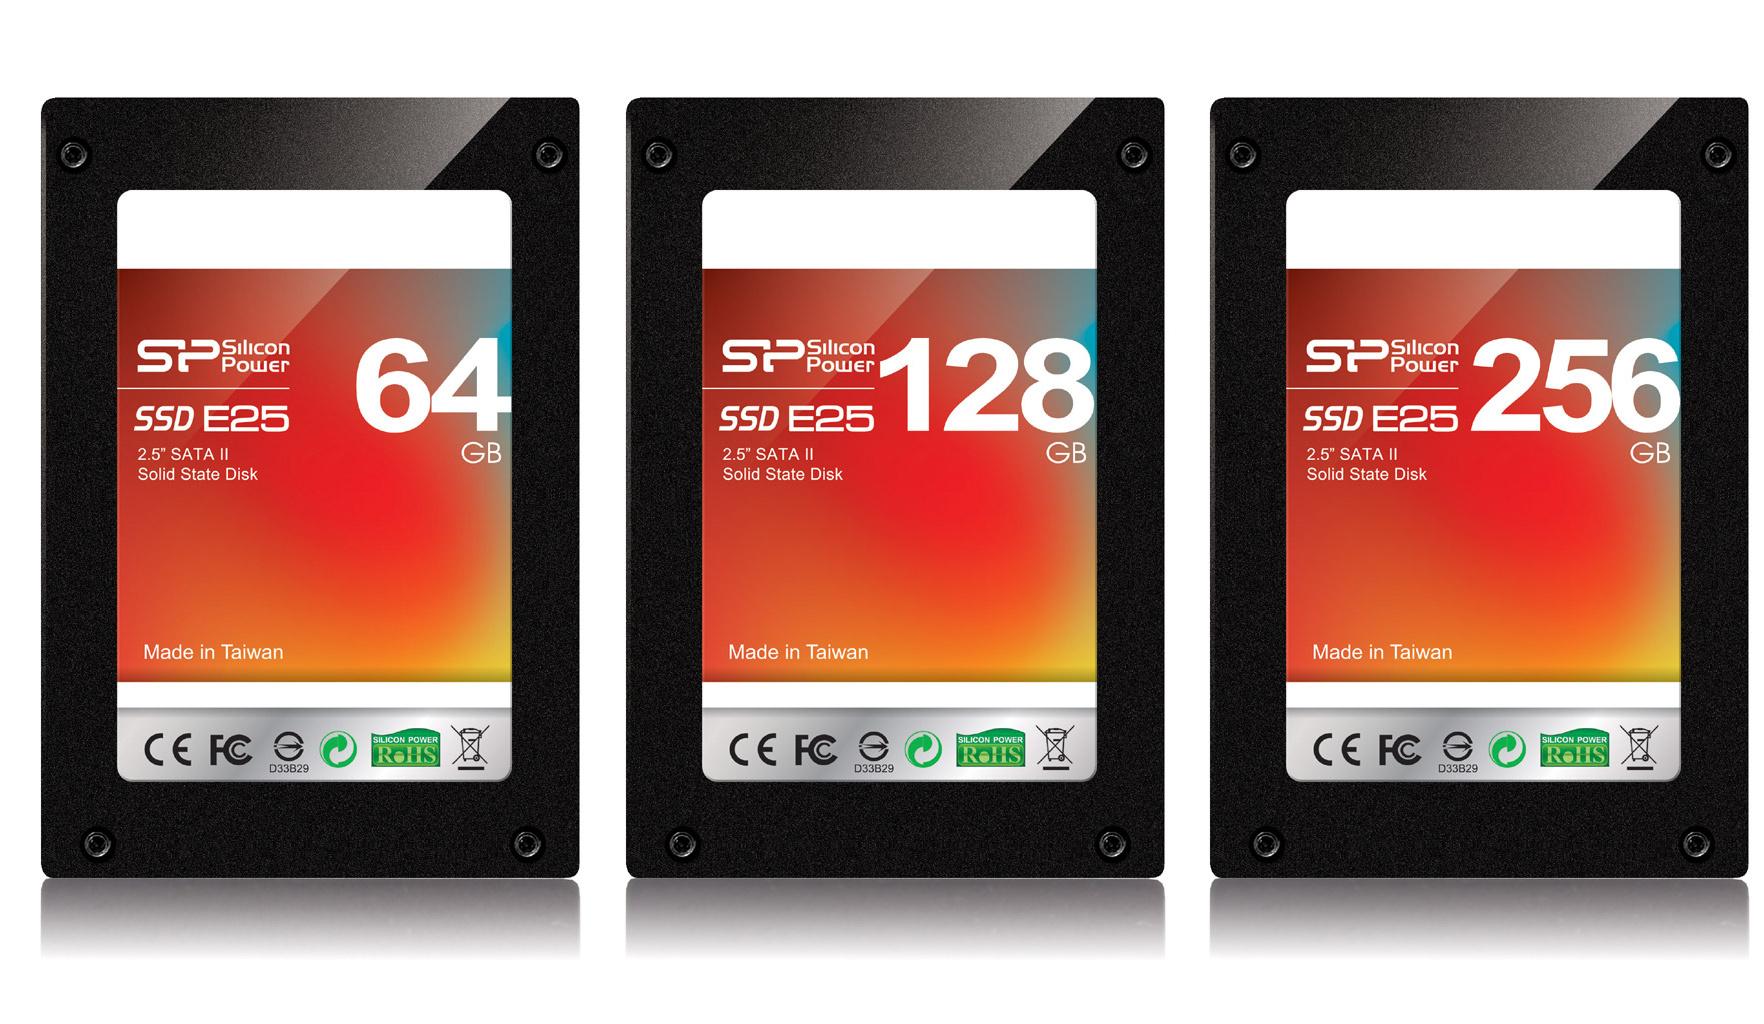 silicon-power-e25-extreme-ssd-0-b.jpg